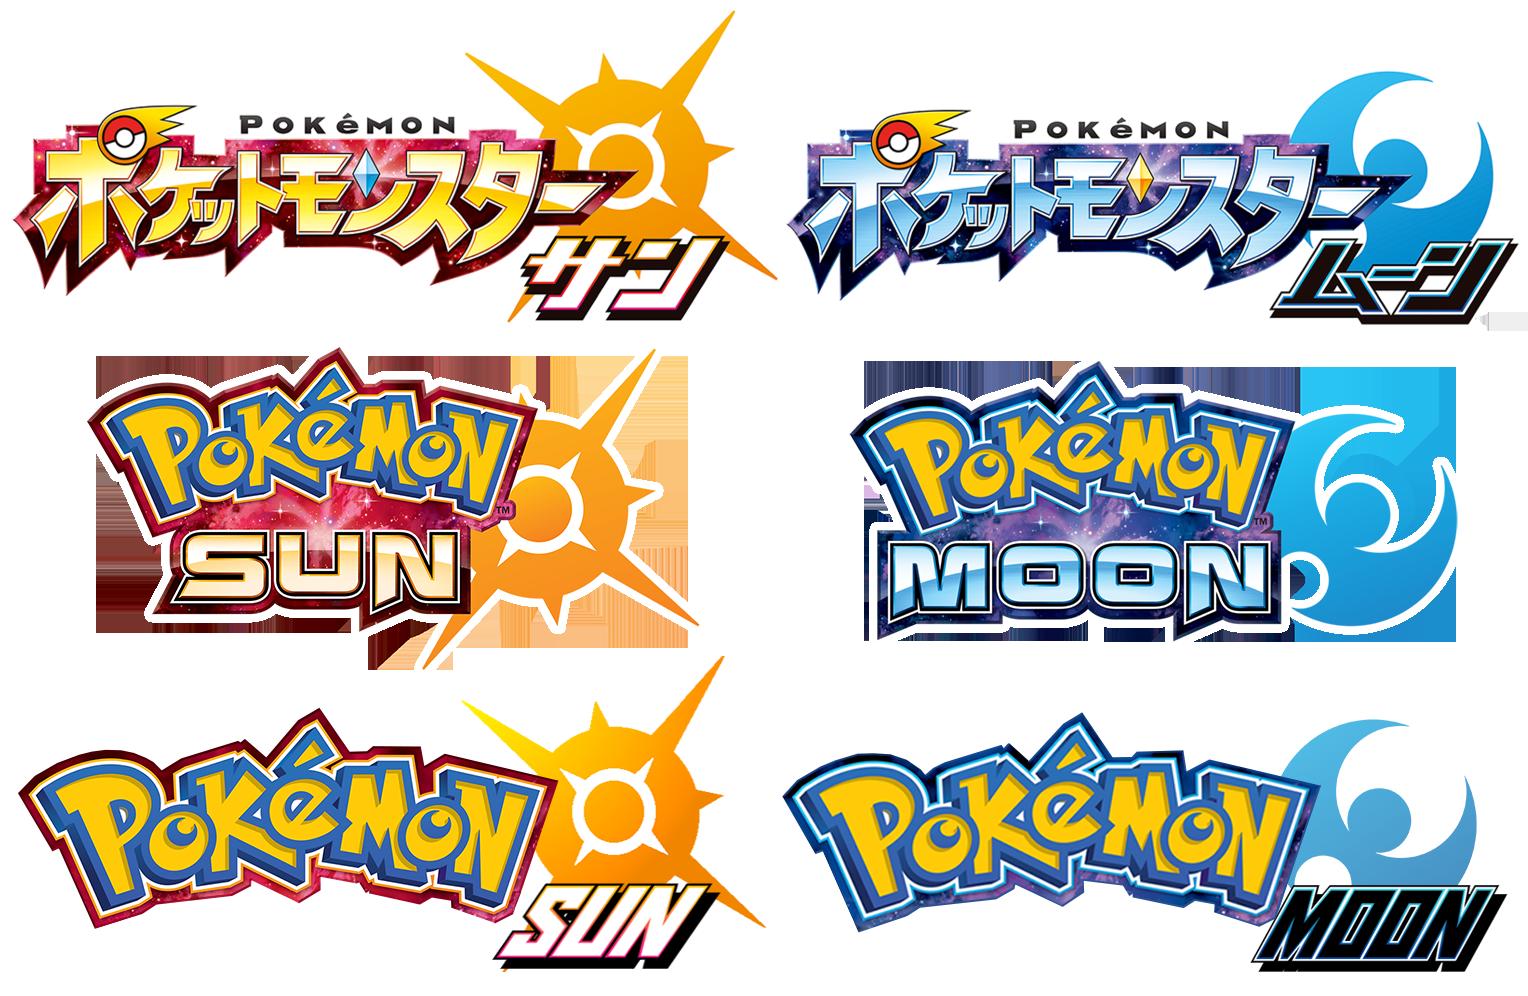 Pokemon Sun And Moon Logos Japanese To English 607783319